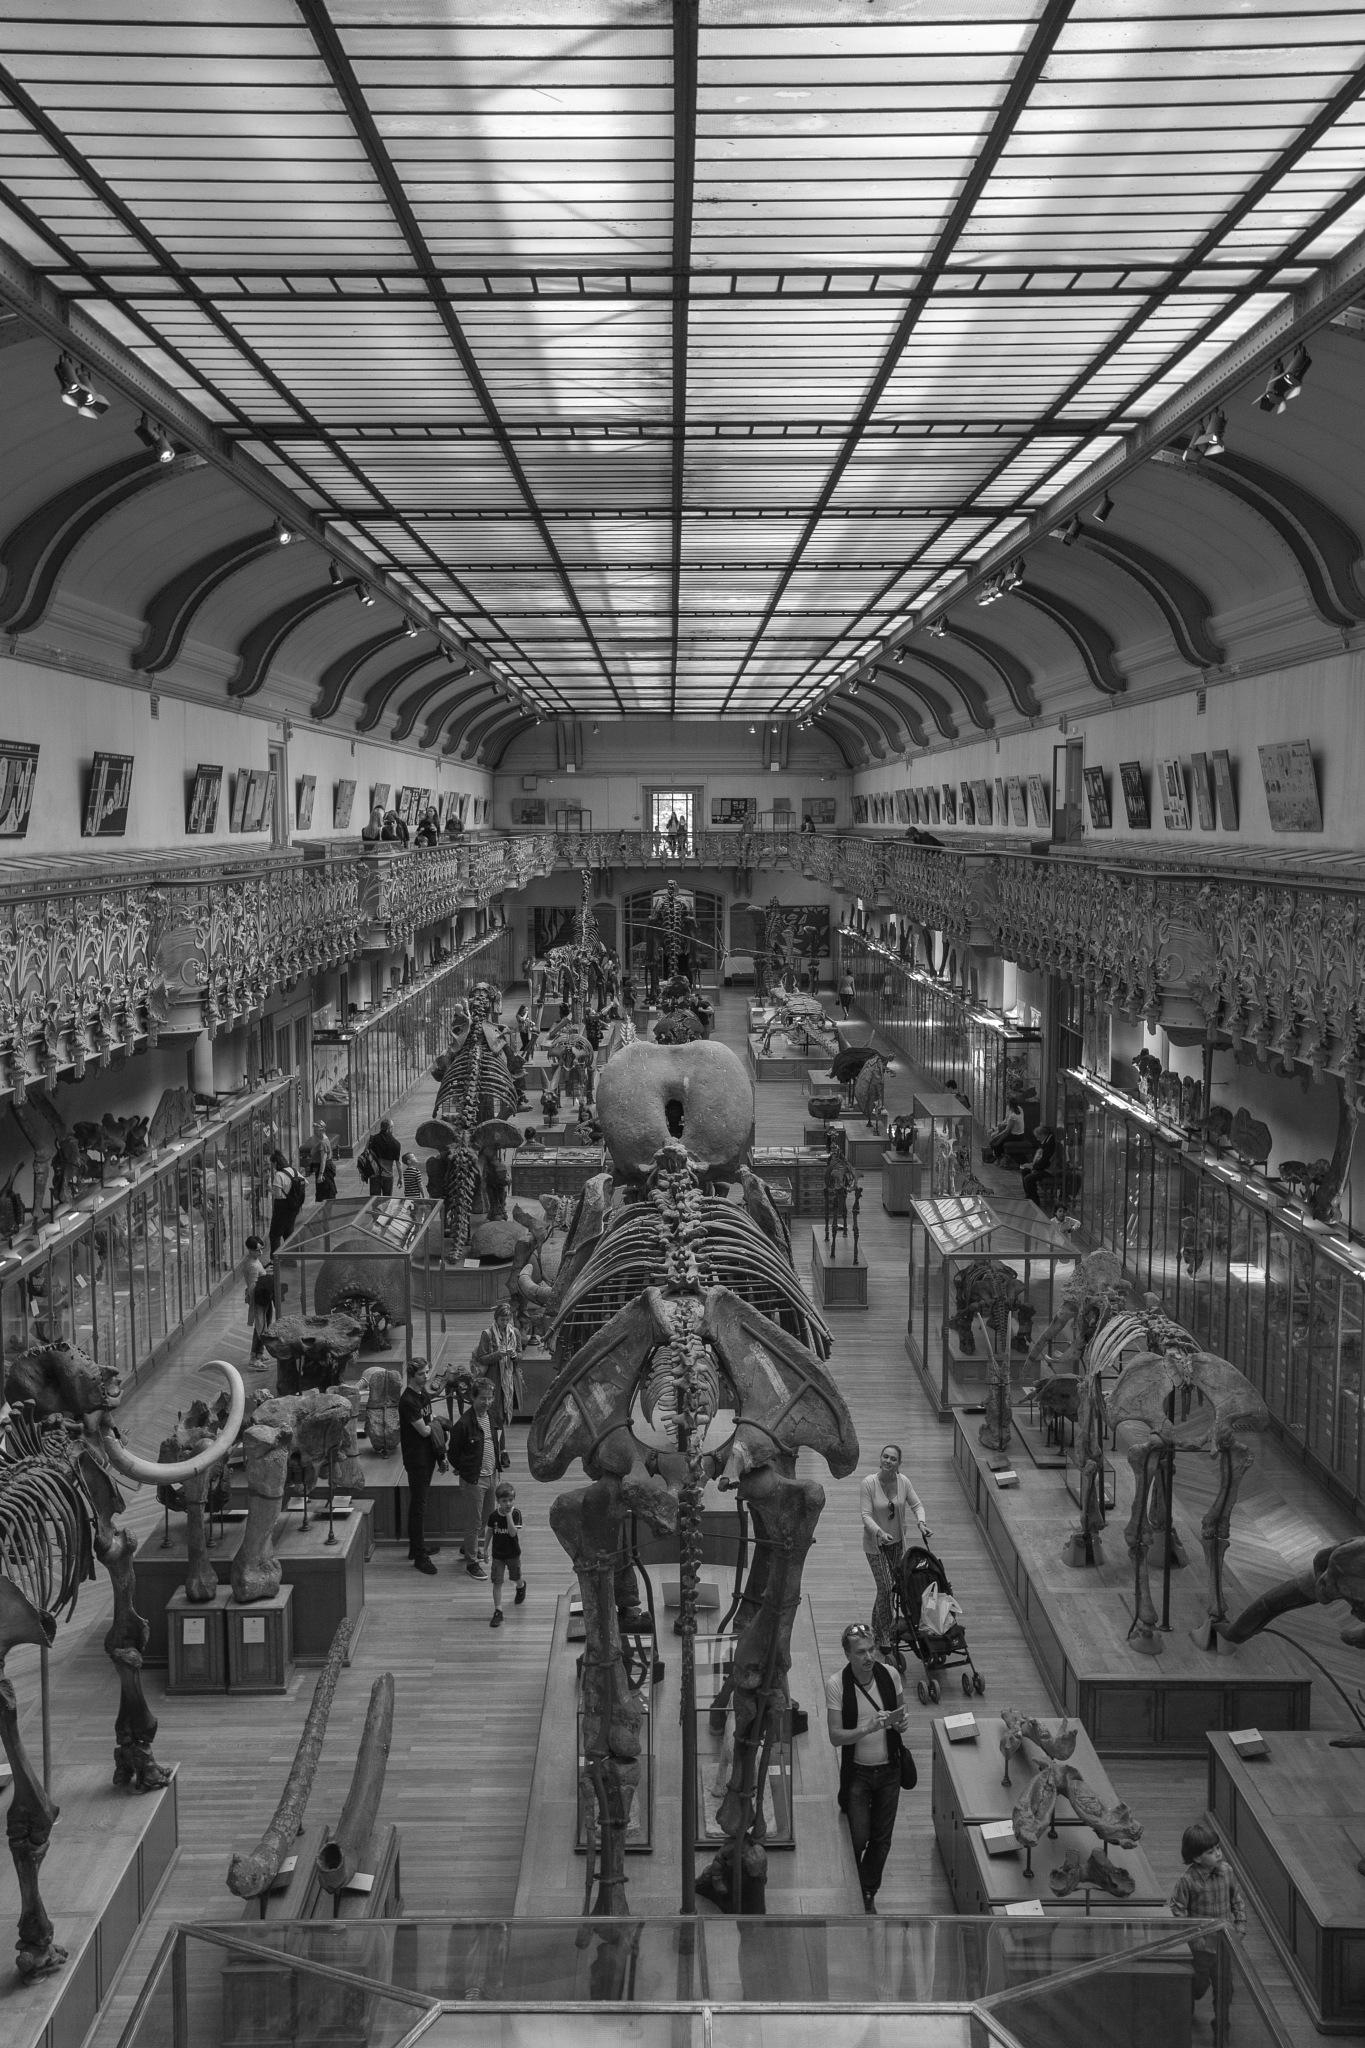 Muséum by Trystan Furia